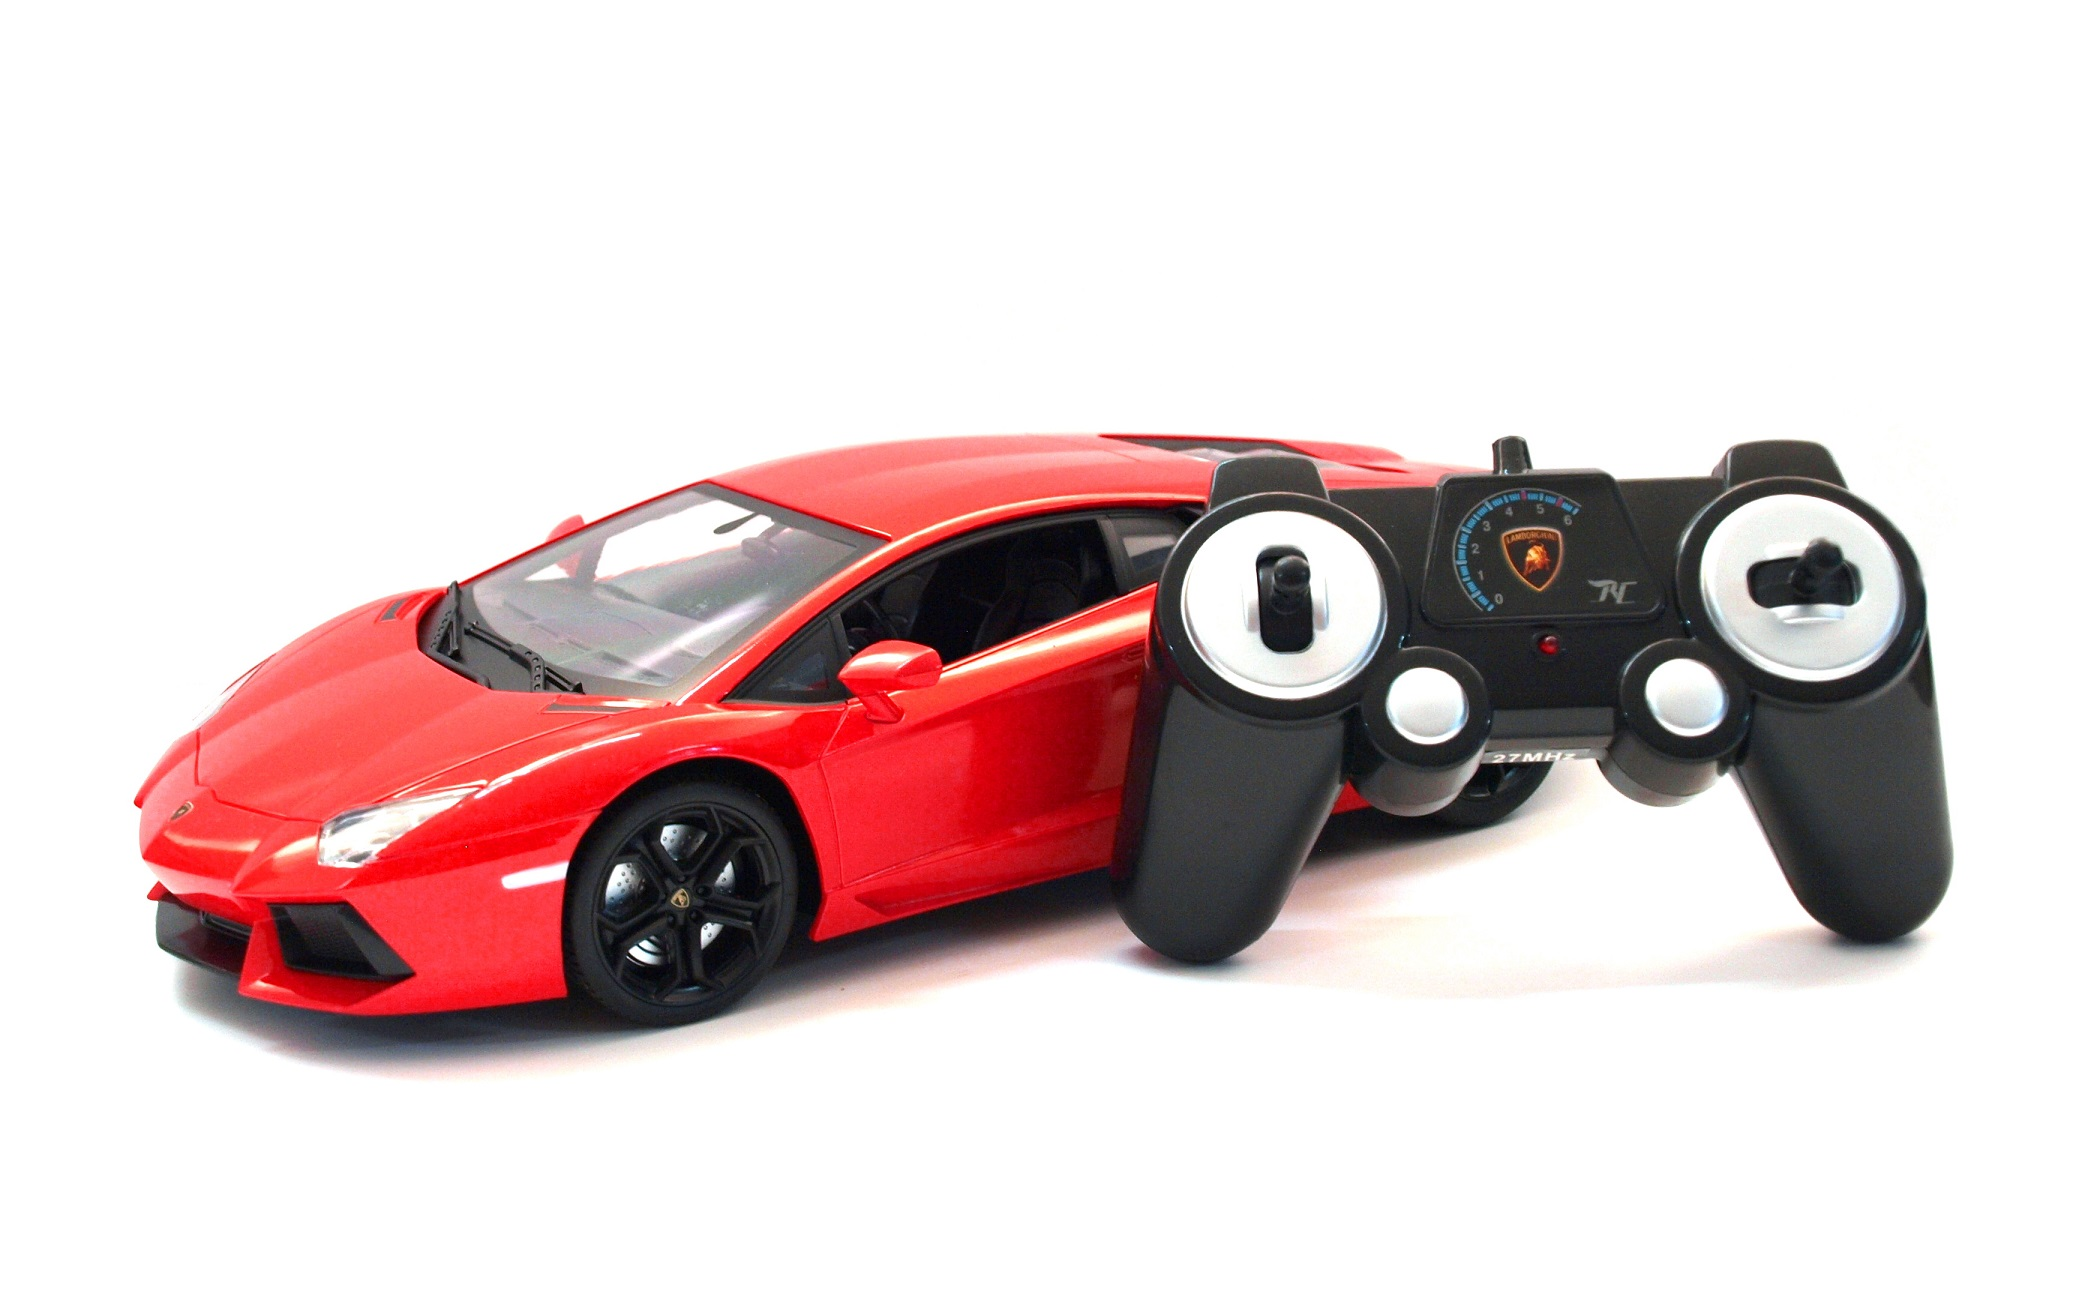 lamborghini aventador 1 14 samochody osobowe gimmik modele zdalnie st. Black Bedroom Furniture Sets. Home Design Ideas